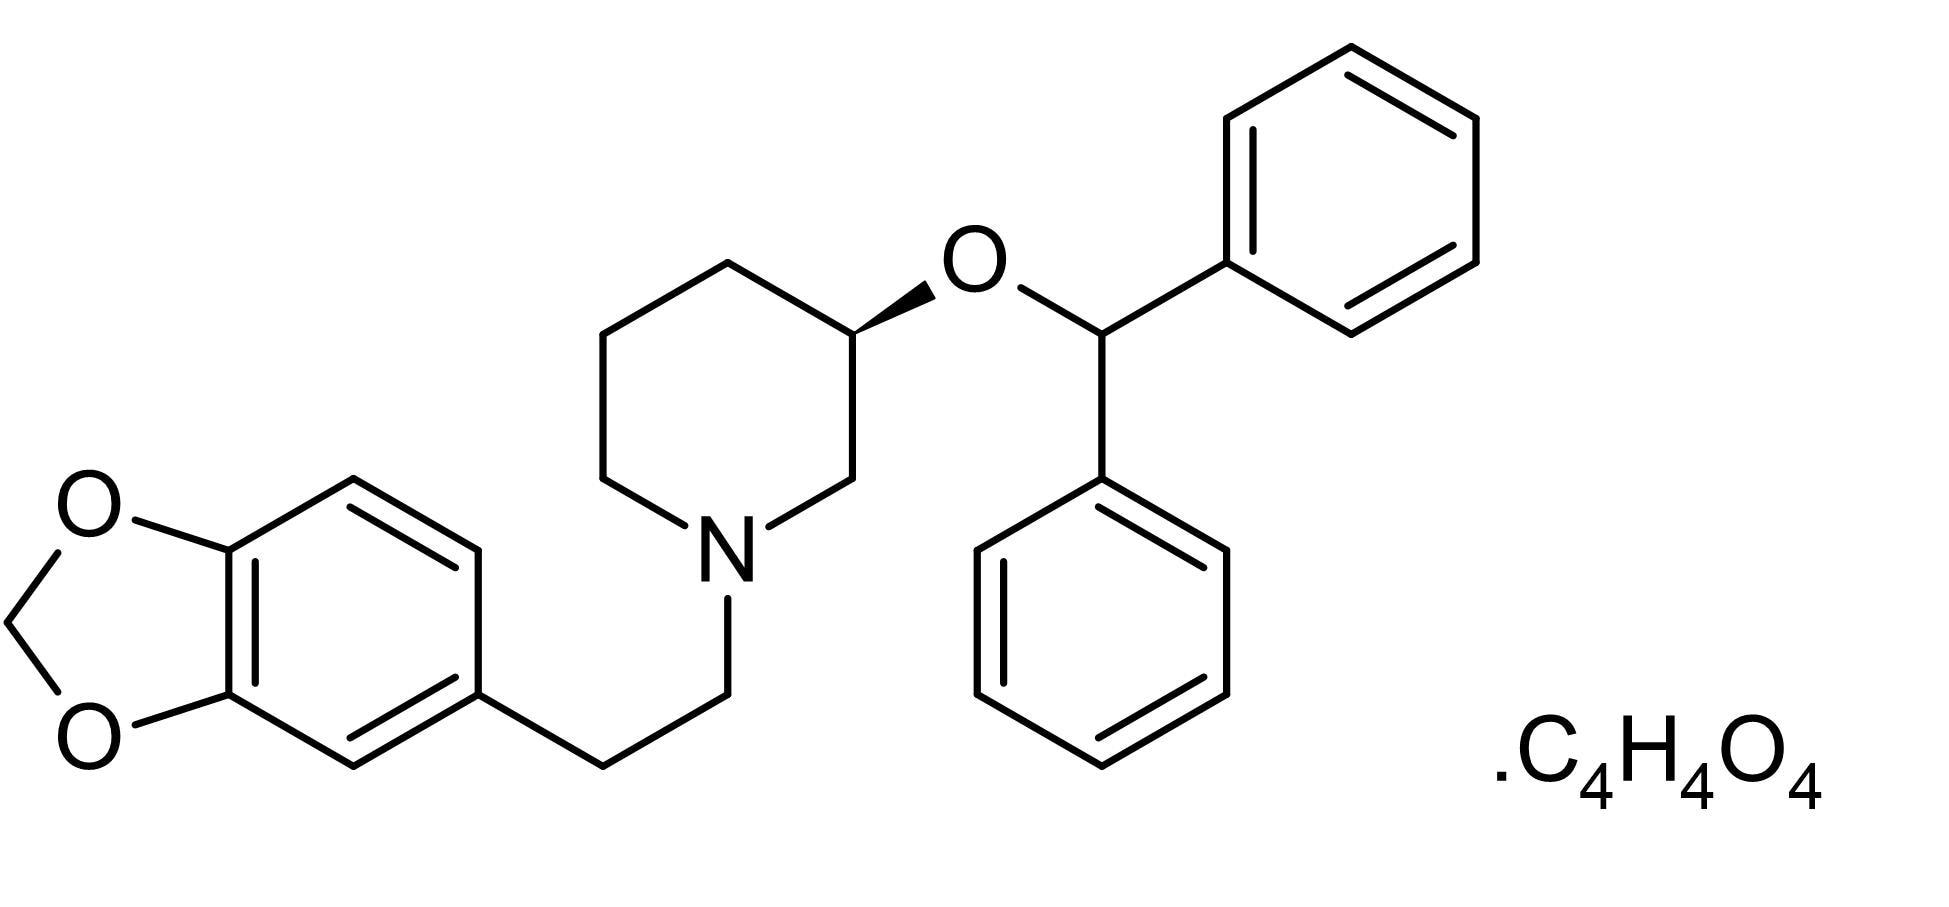 Chemical Structure - Zamifenacin fumarate, M<sub>3</sub> receptor antagonist (ab141511)